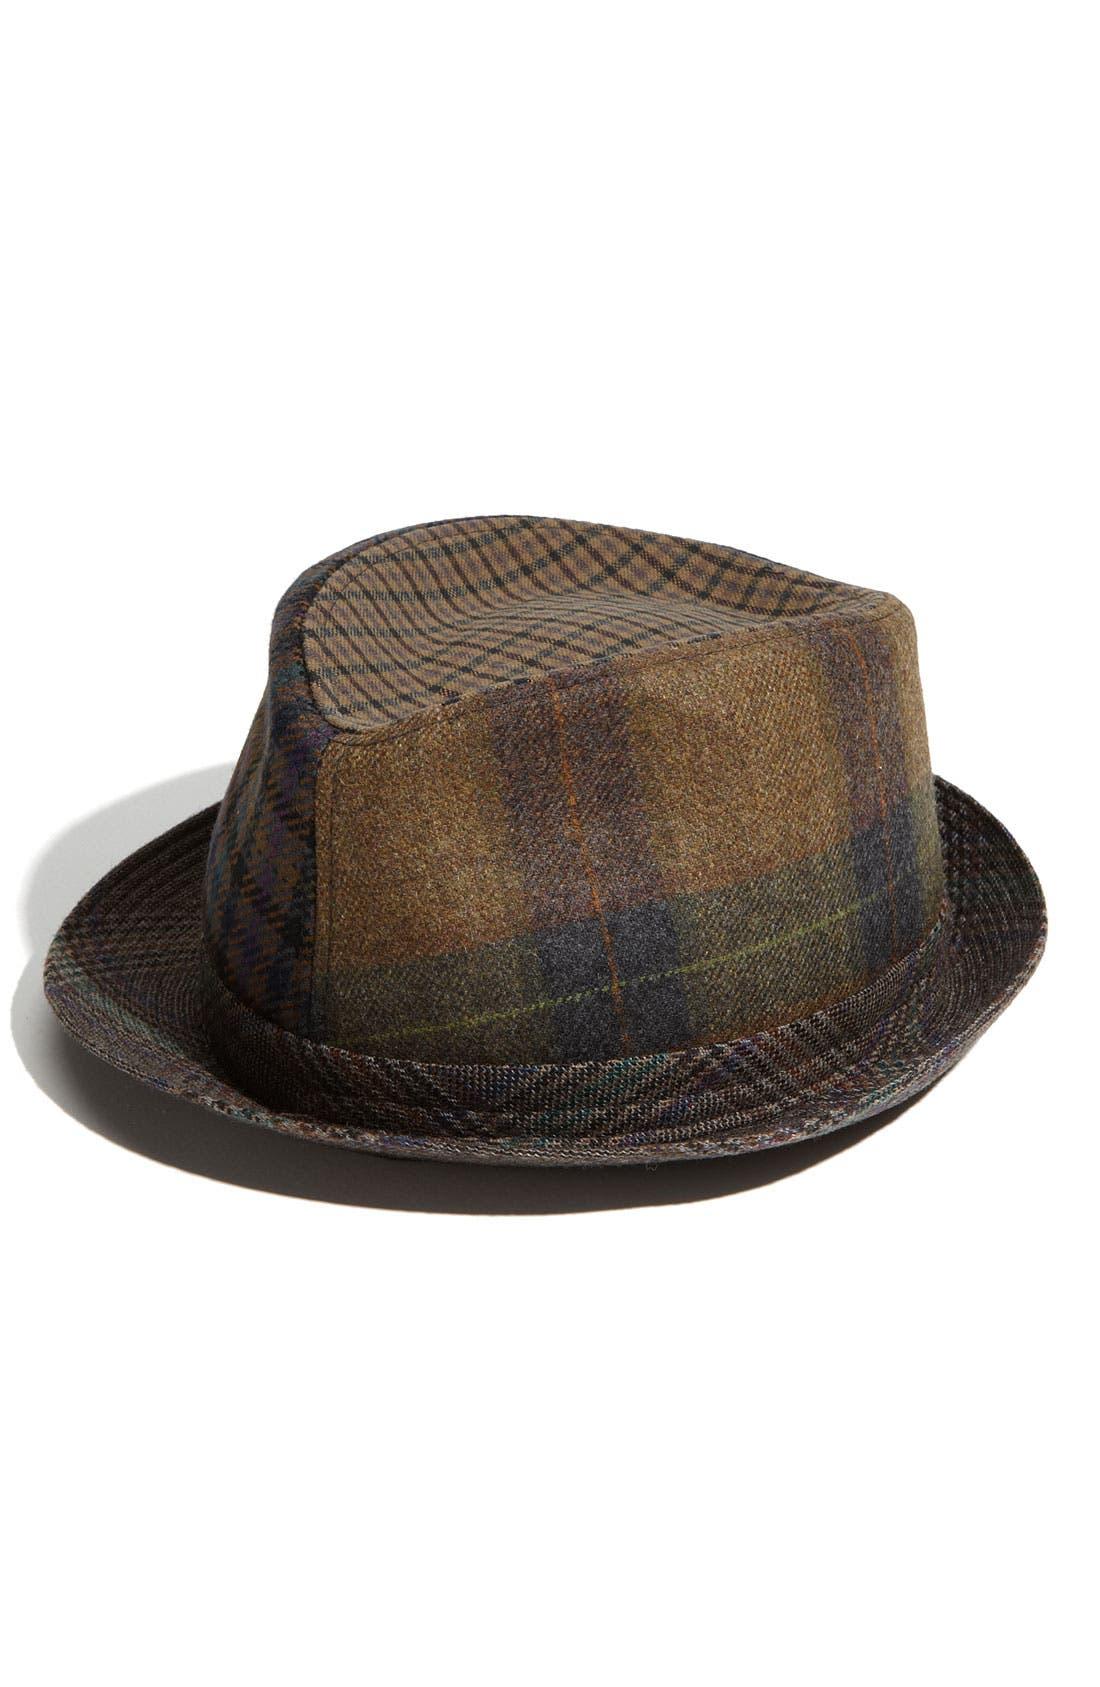 Alternate Image 1 Selected - Etro Mixed Print Wool Hat